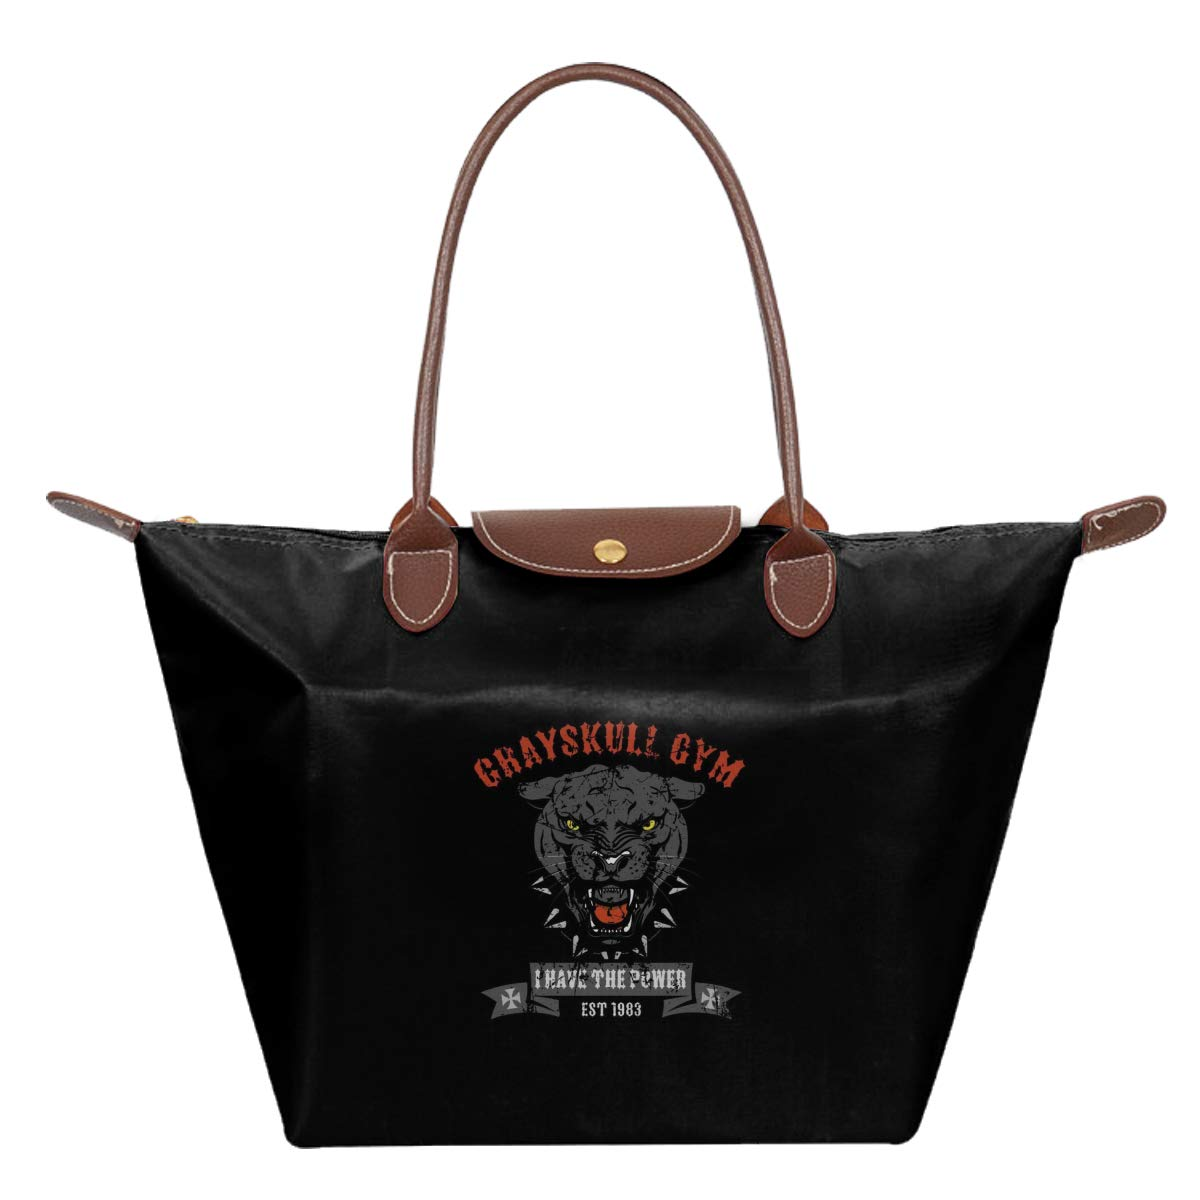 He Man Grayskull Gym Waterproof Leather Folded Messenger Nylon Bag Travel Tote Hopping Folding School Handbags